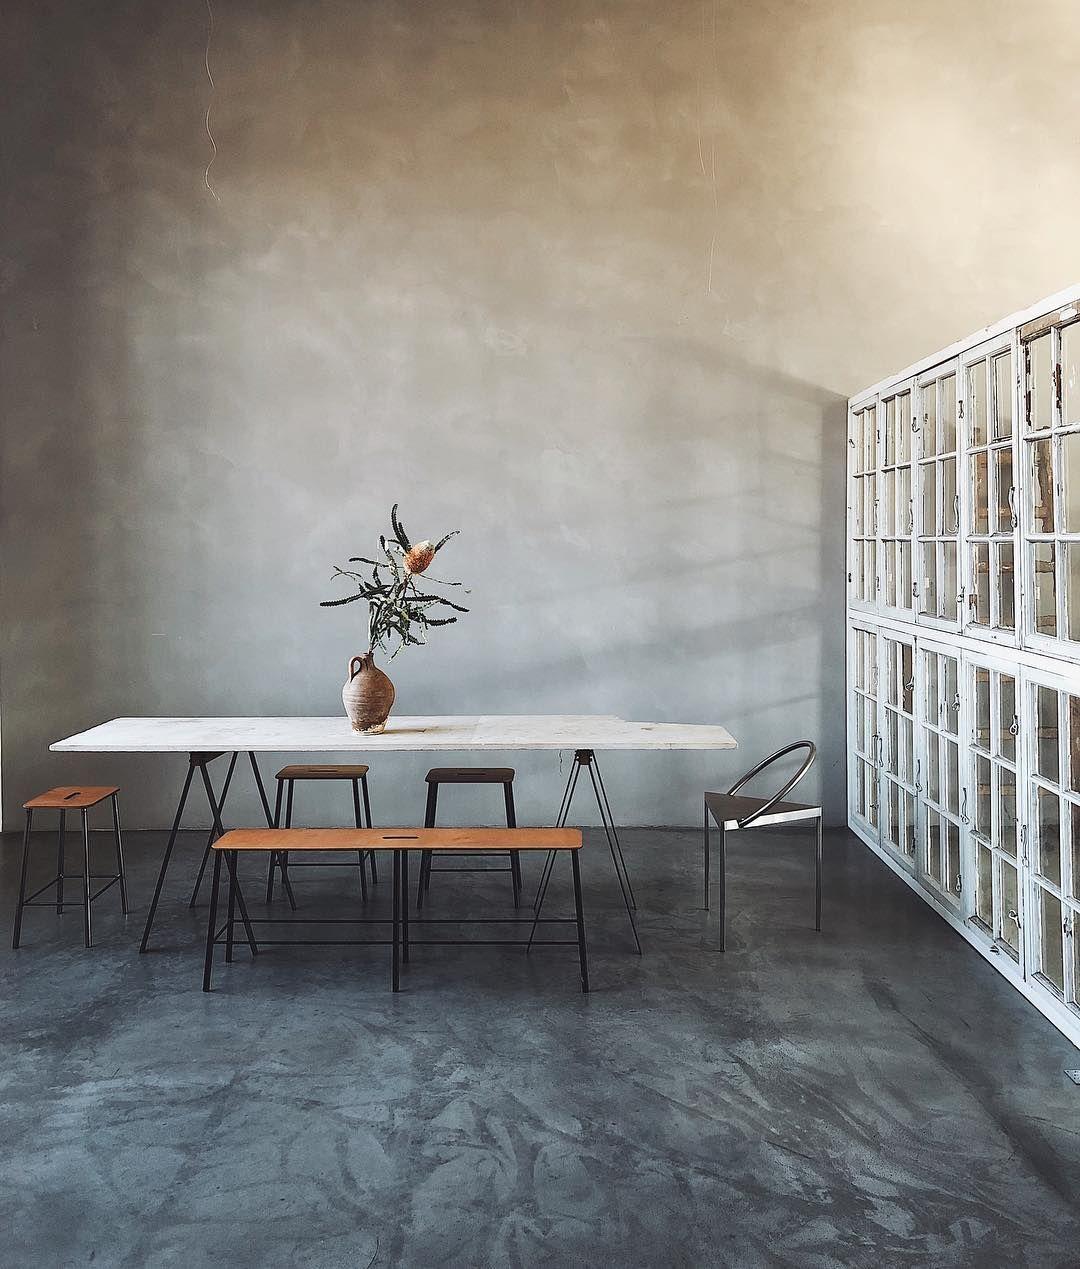 Industrial Studio Loft With Concrete Floor And Painted Walls Vintage Elements Studio Office Inspiration Concrete Interiors Interior Concrete Floors